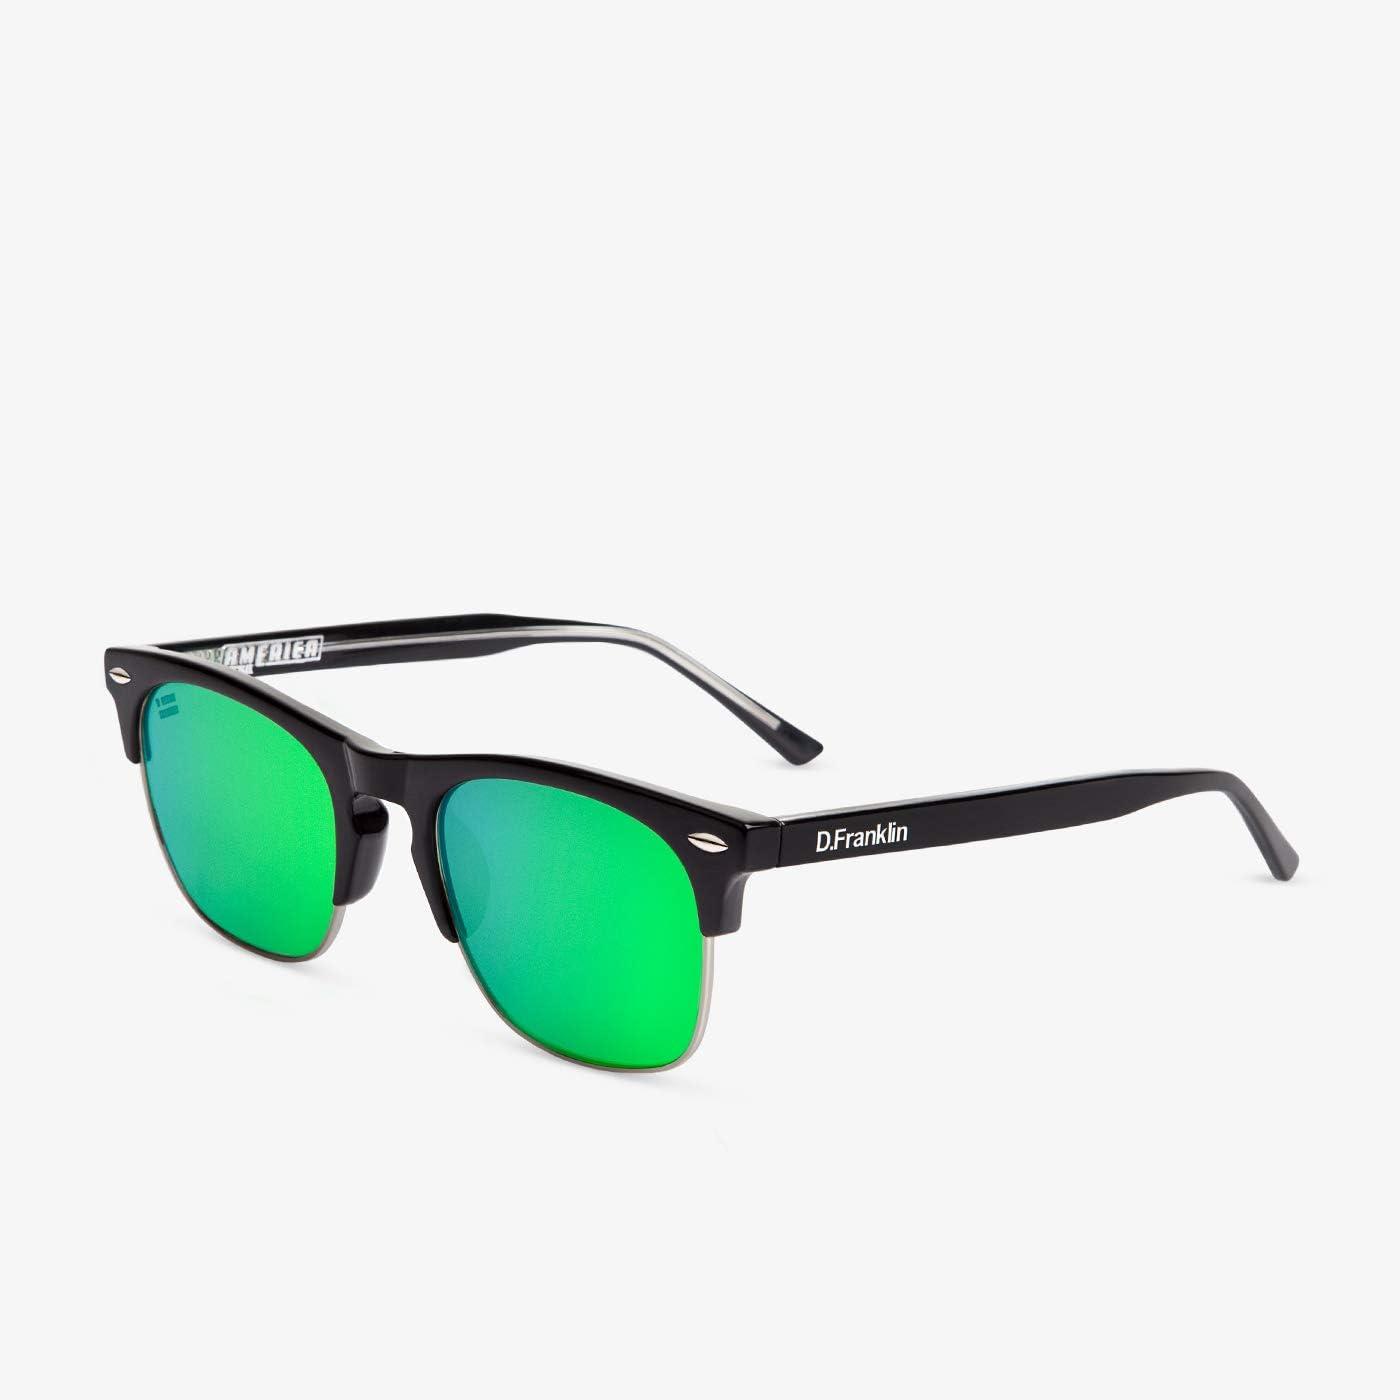 D Franklin Sunglasses